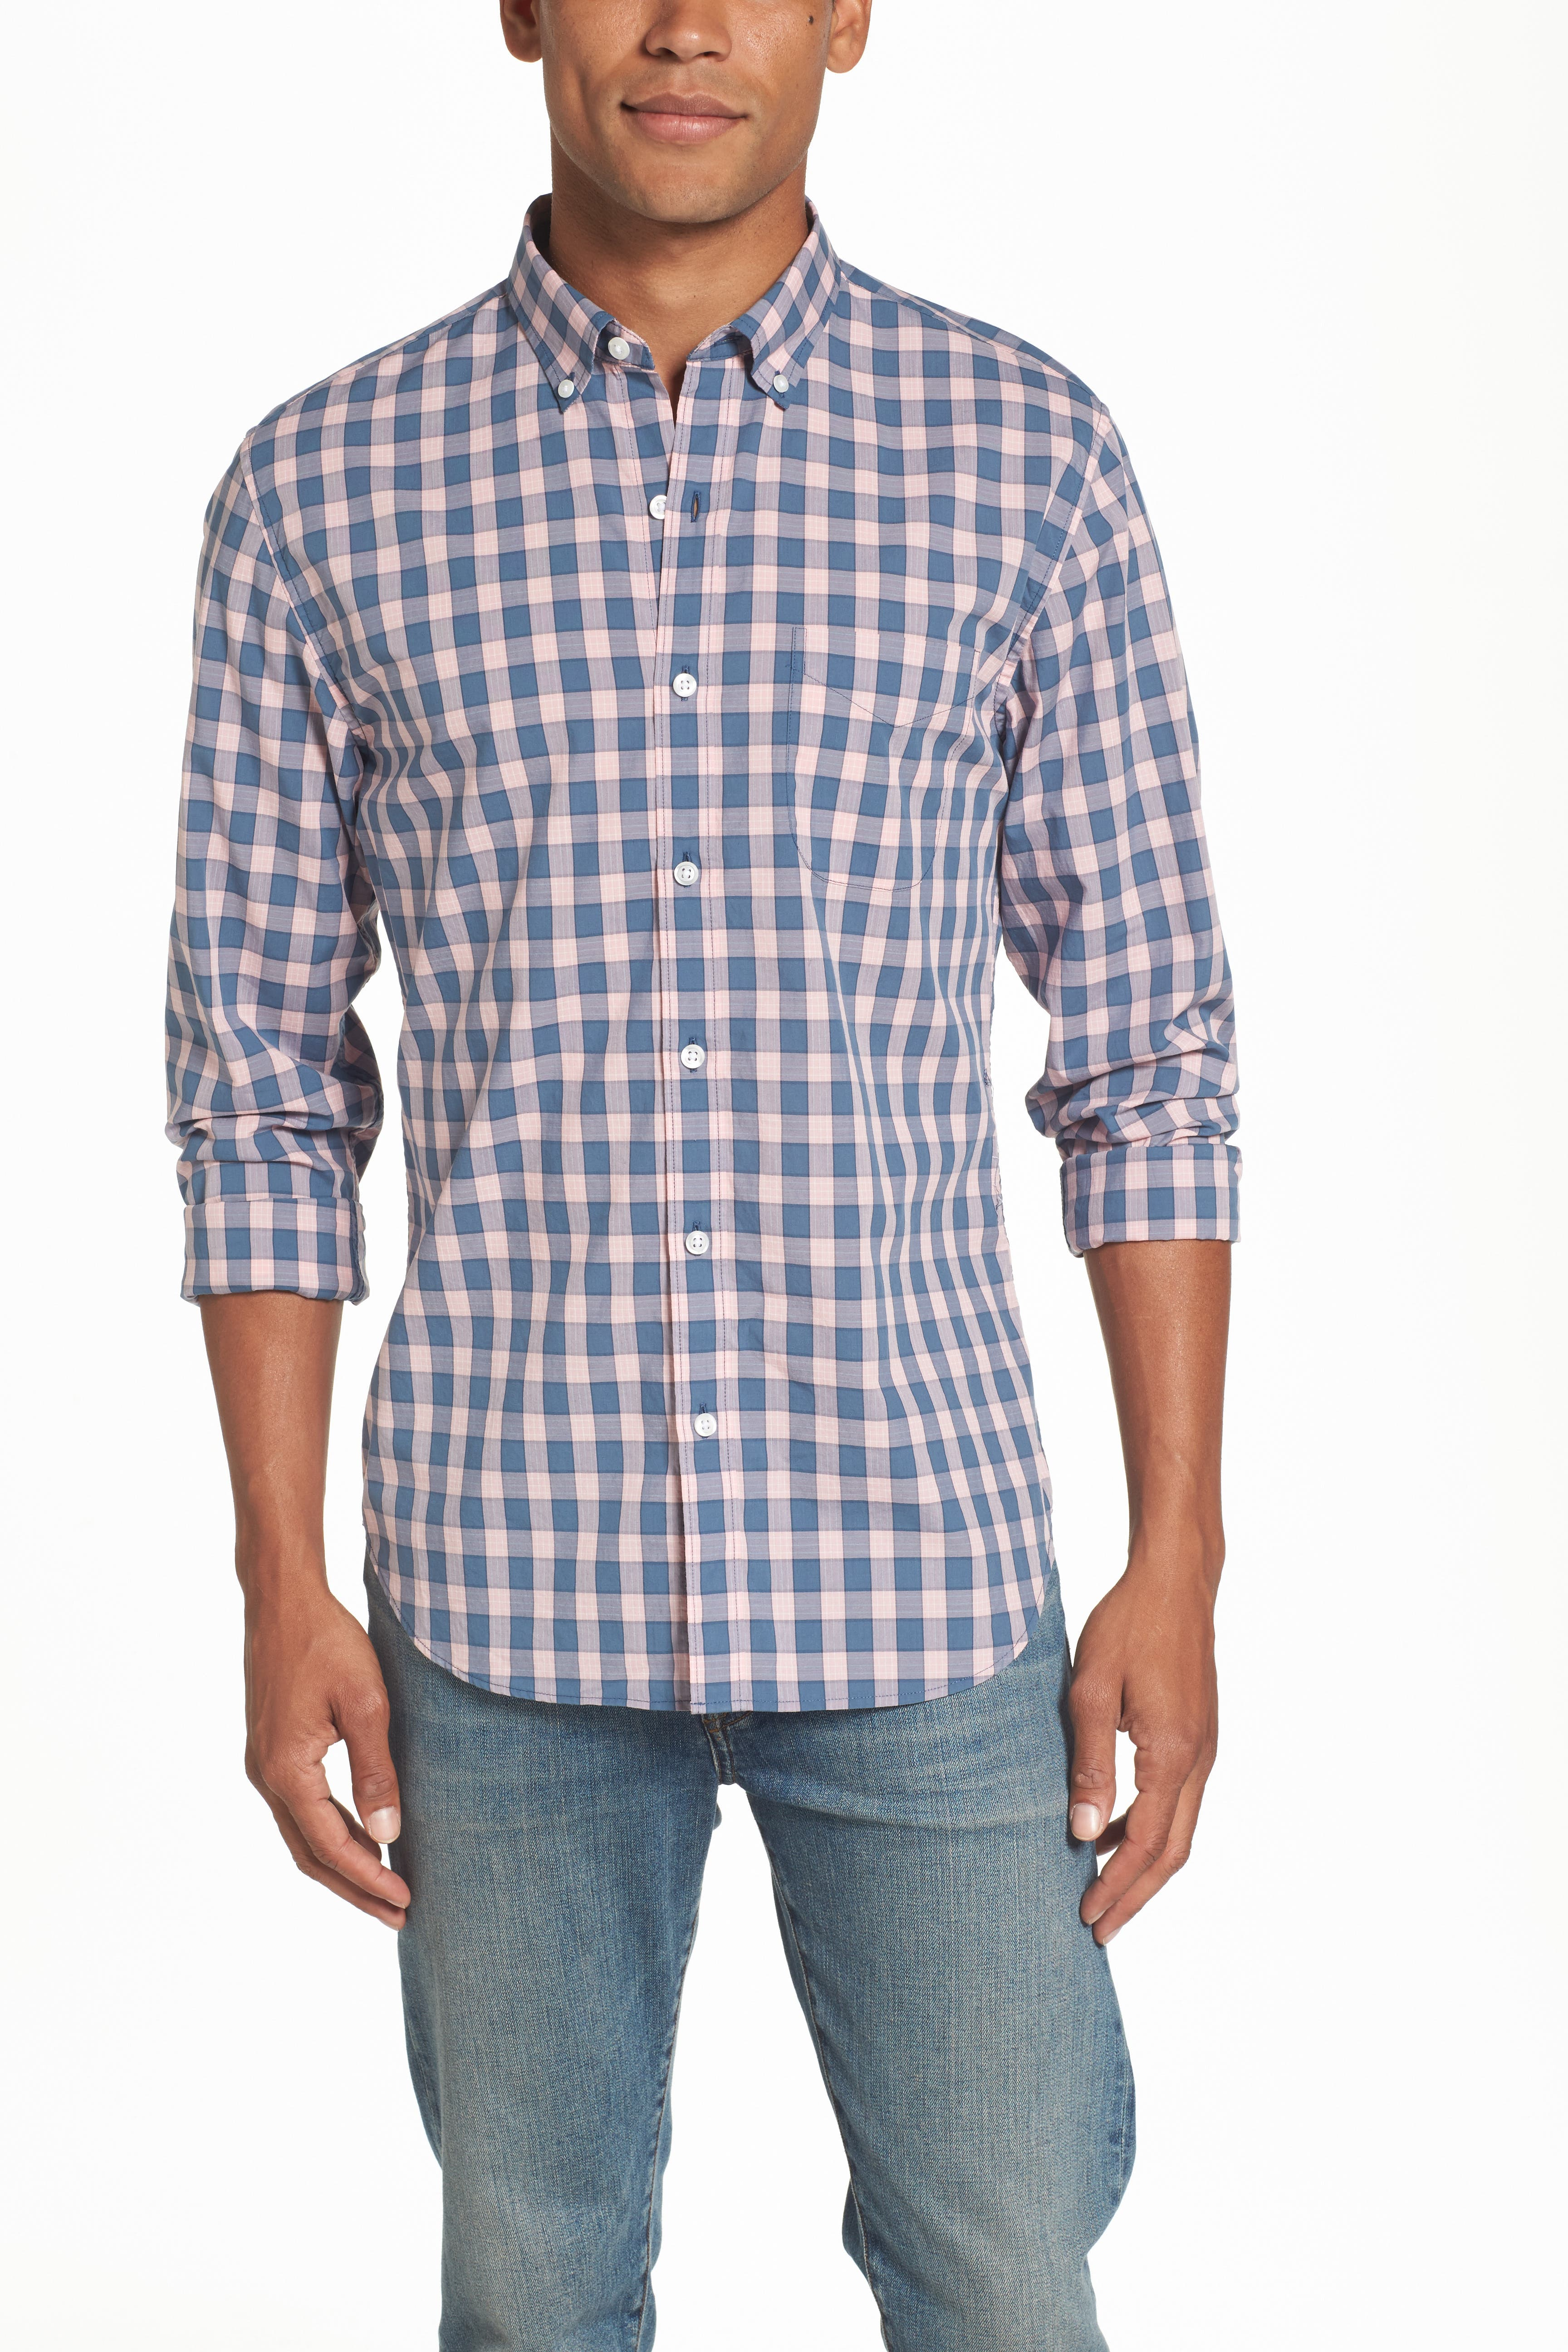 Shirts for Men, Men's Pink Check & Plaid Shirts | Nordstrom